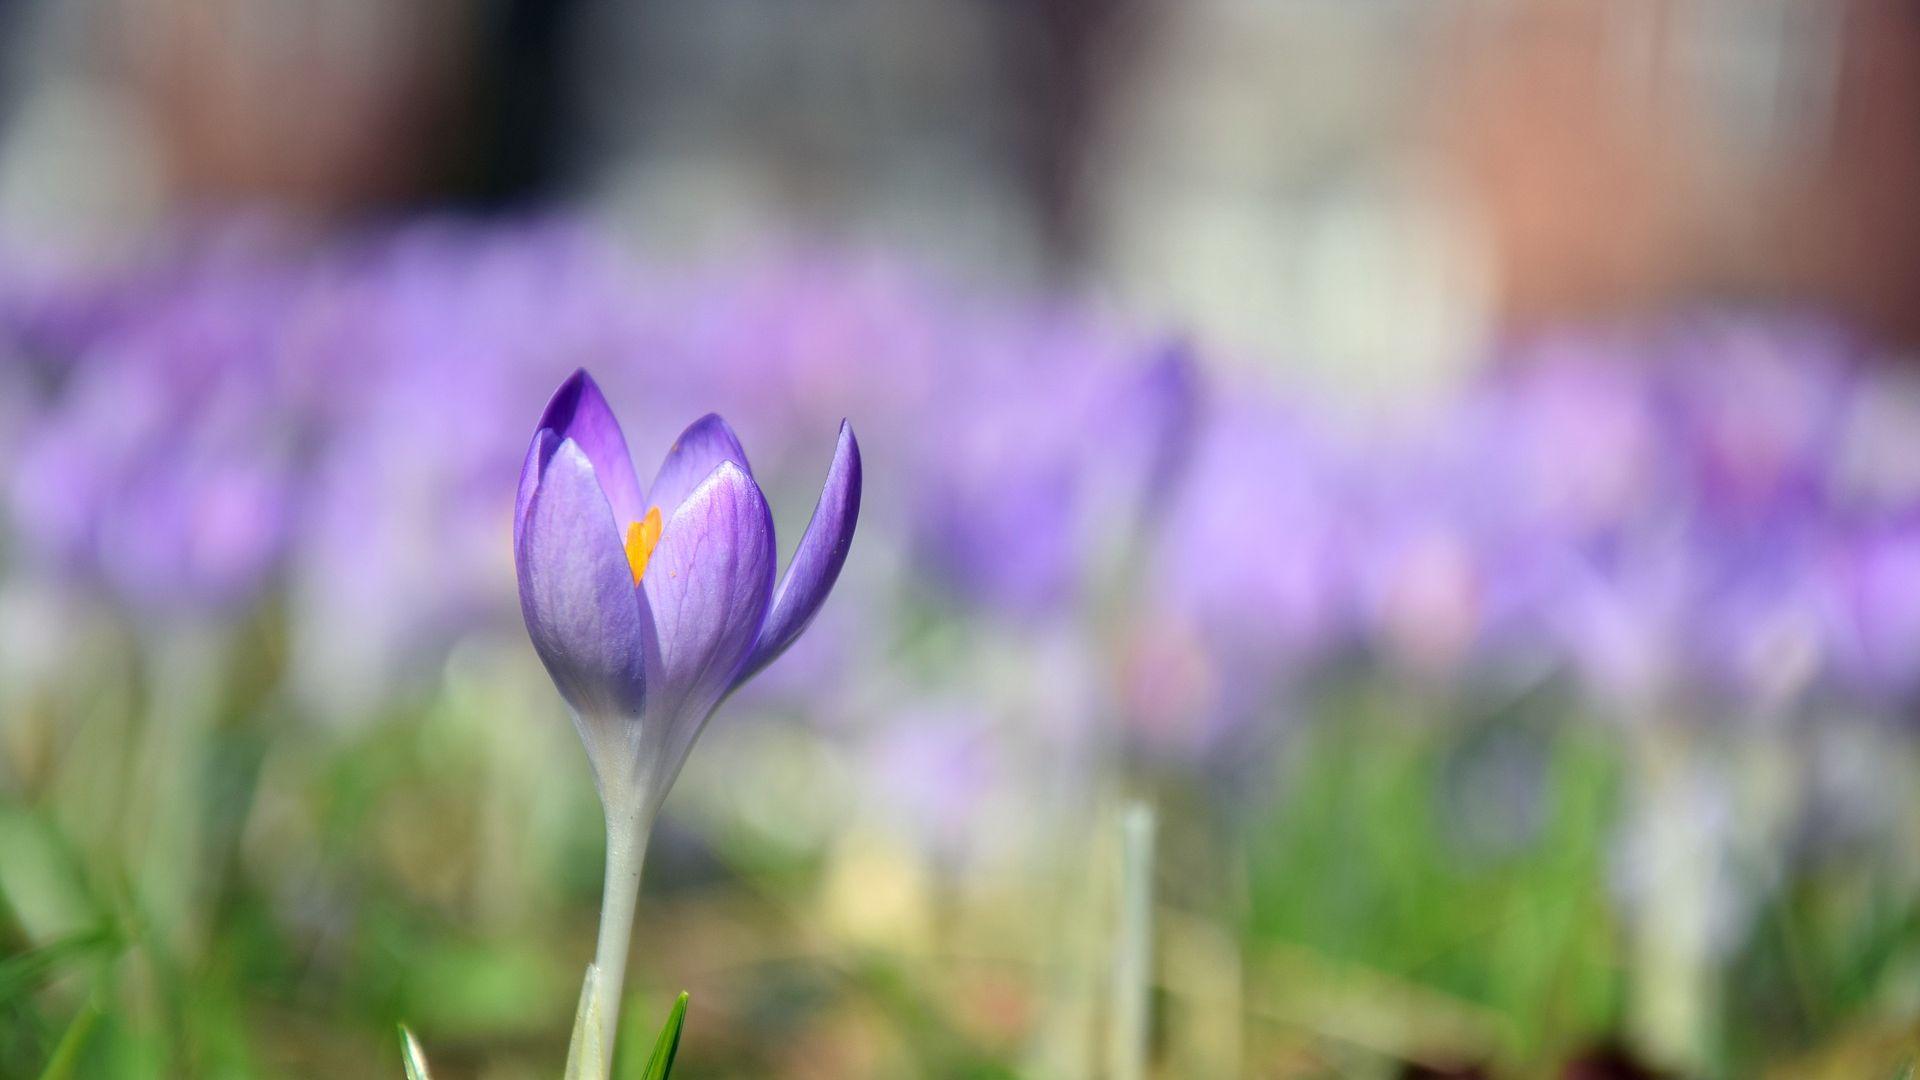 Crocus, purple, single flower, blur Wallpaper